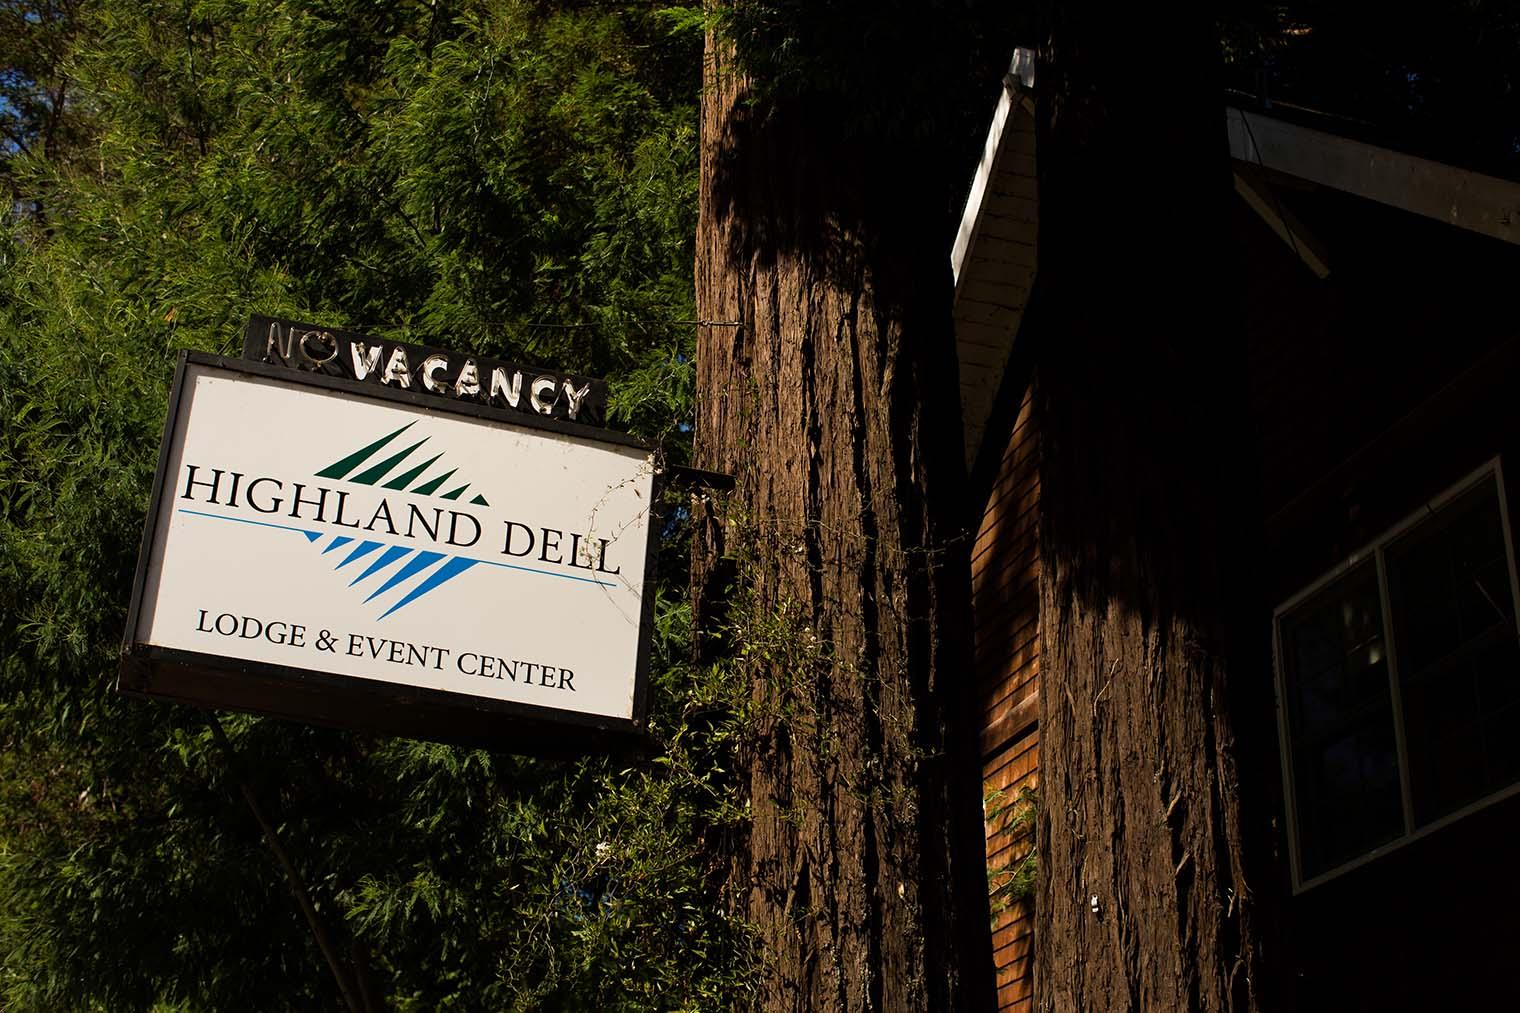 Highland Dell Lodge sign